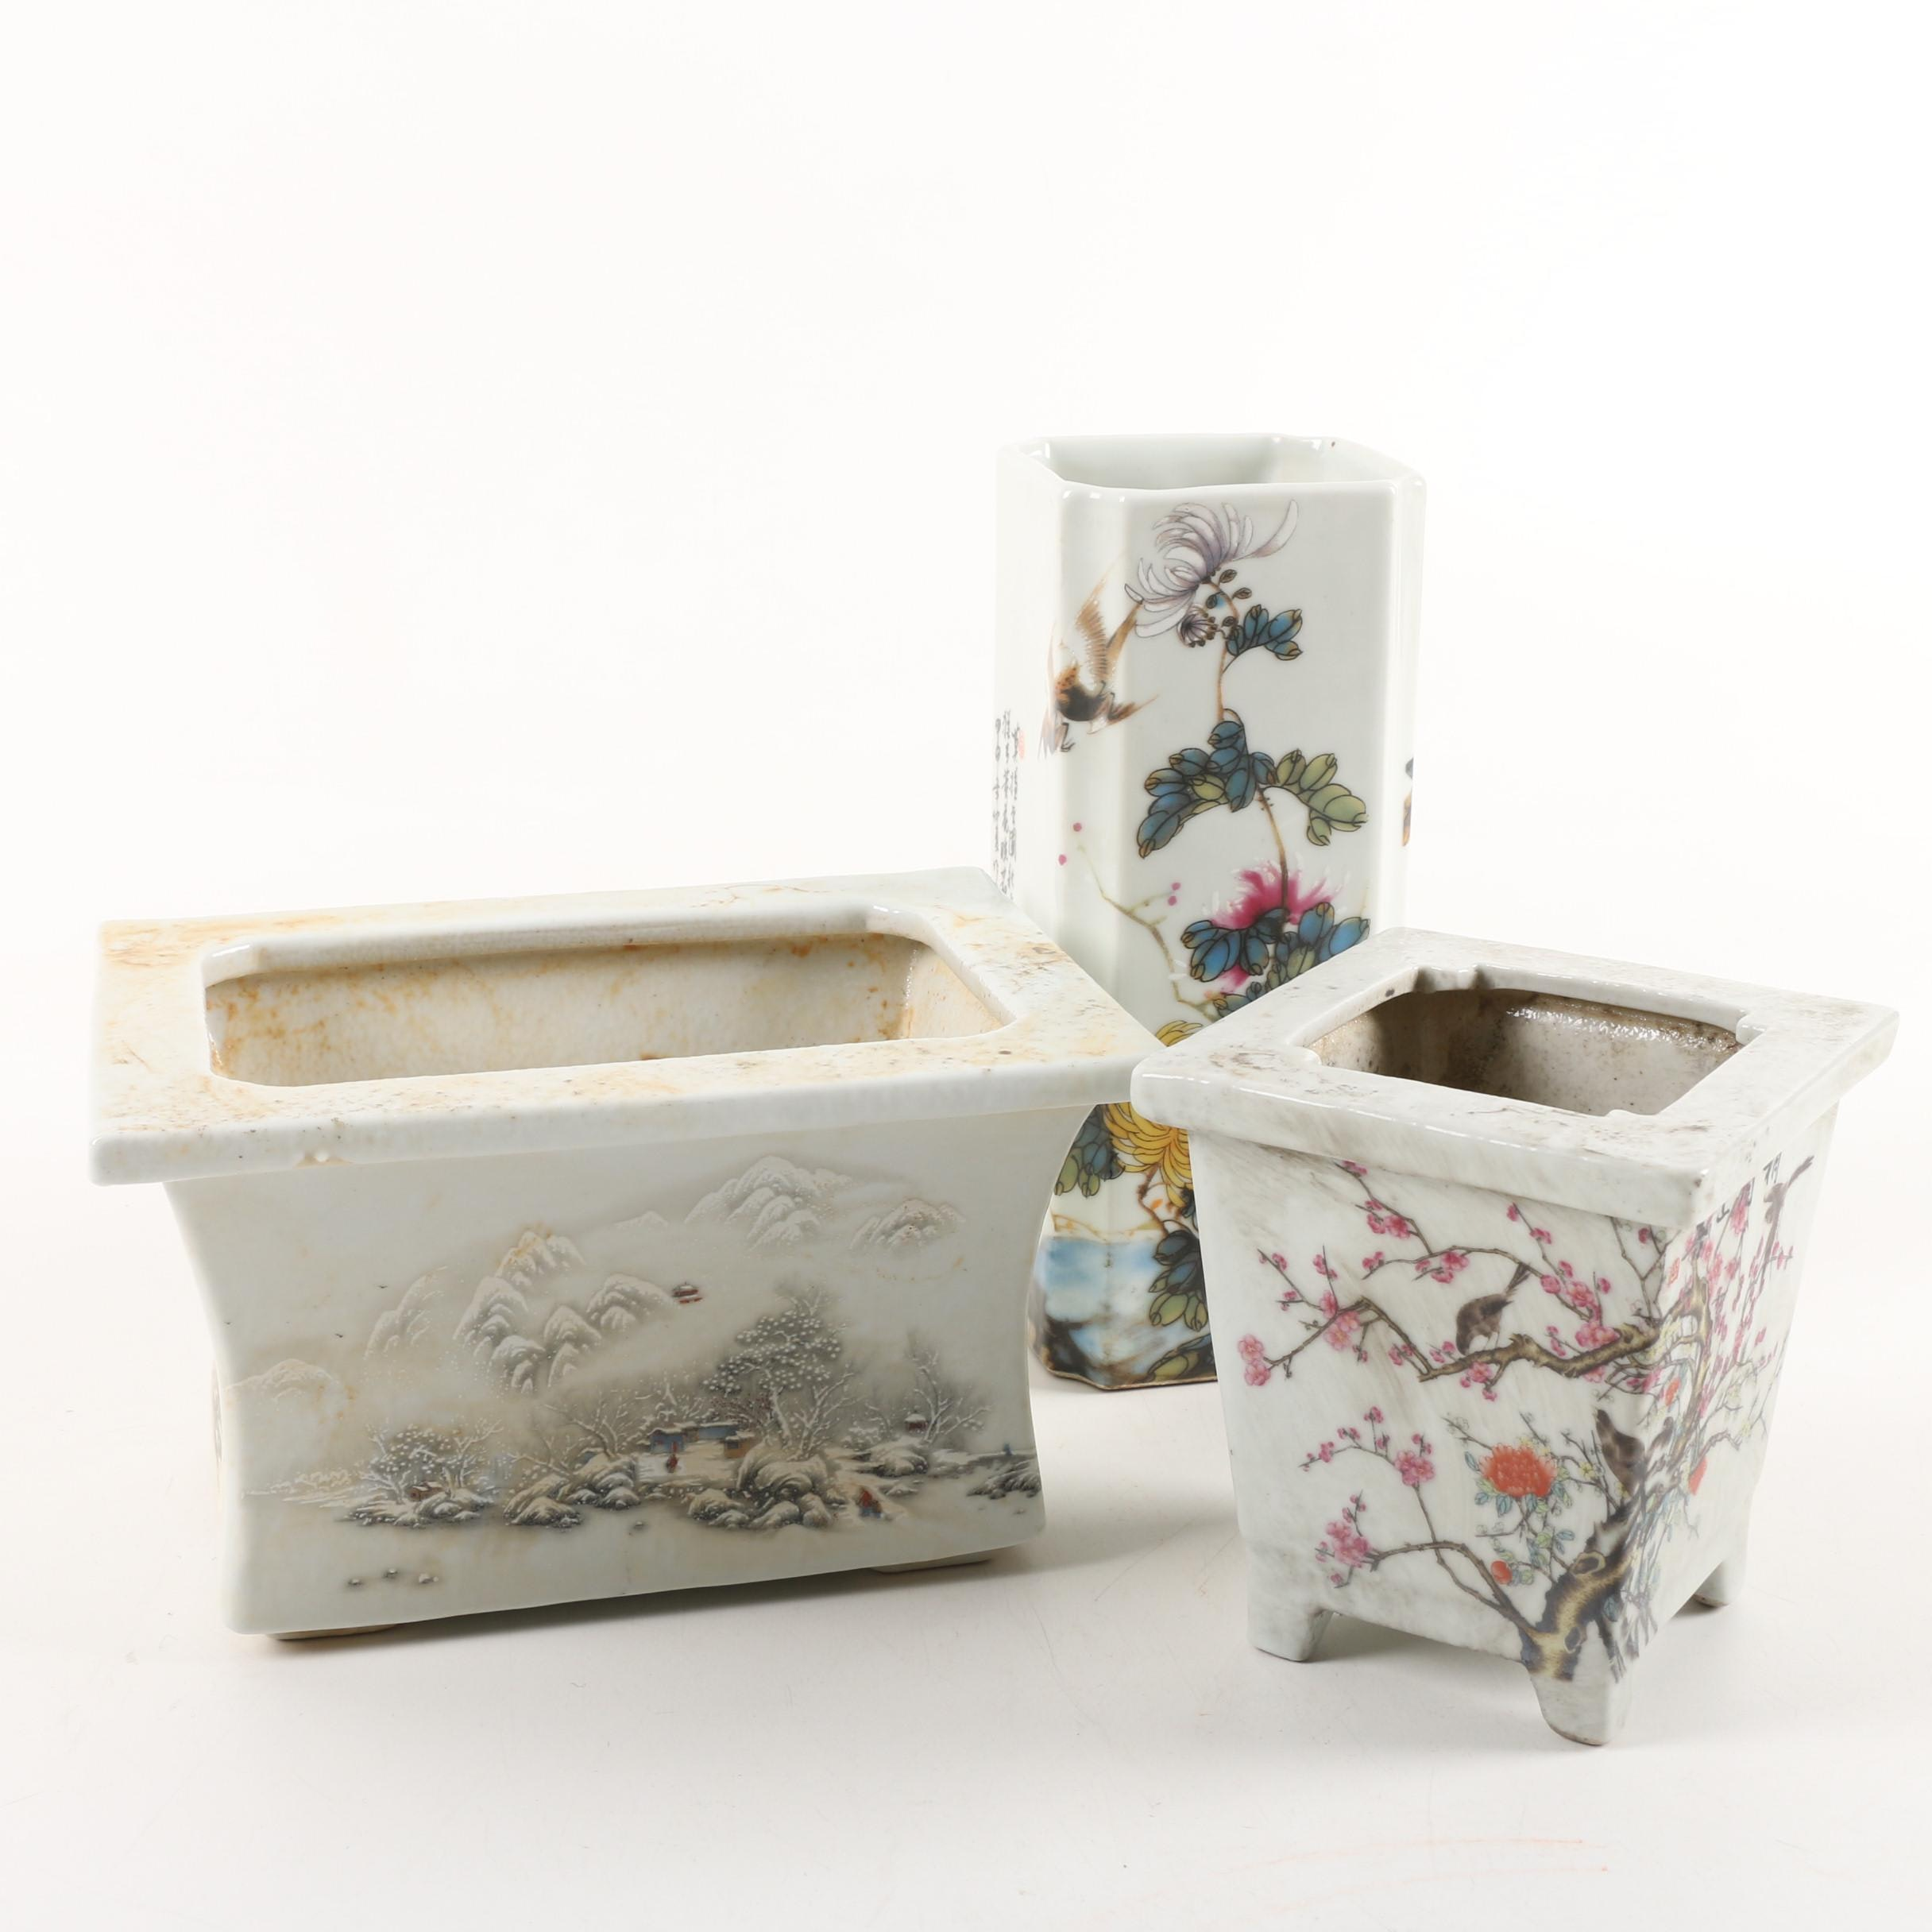 Chinese Ceramic Planters and Vase